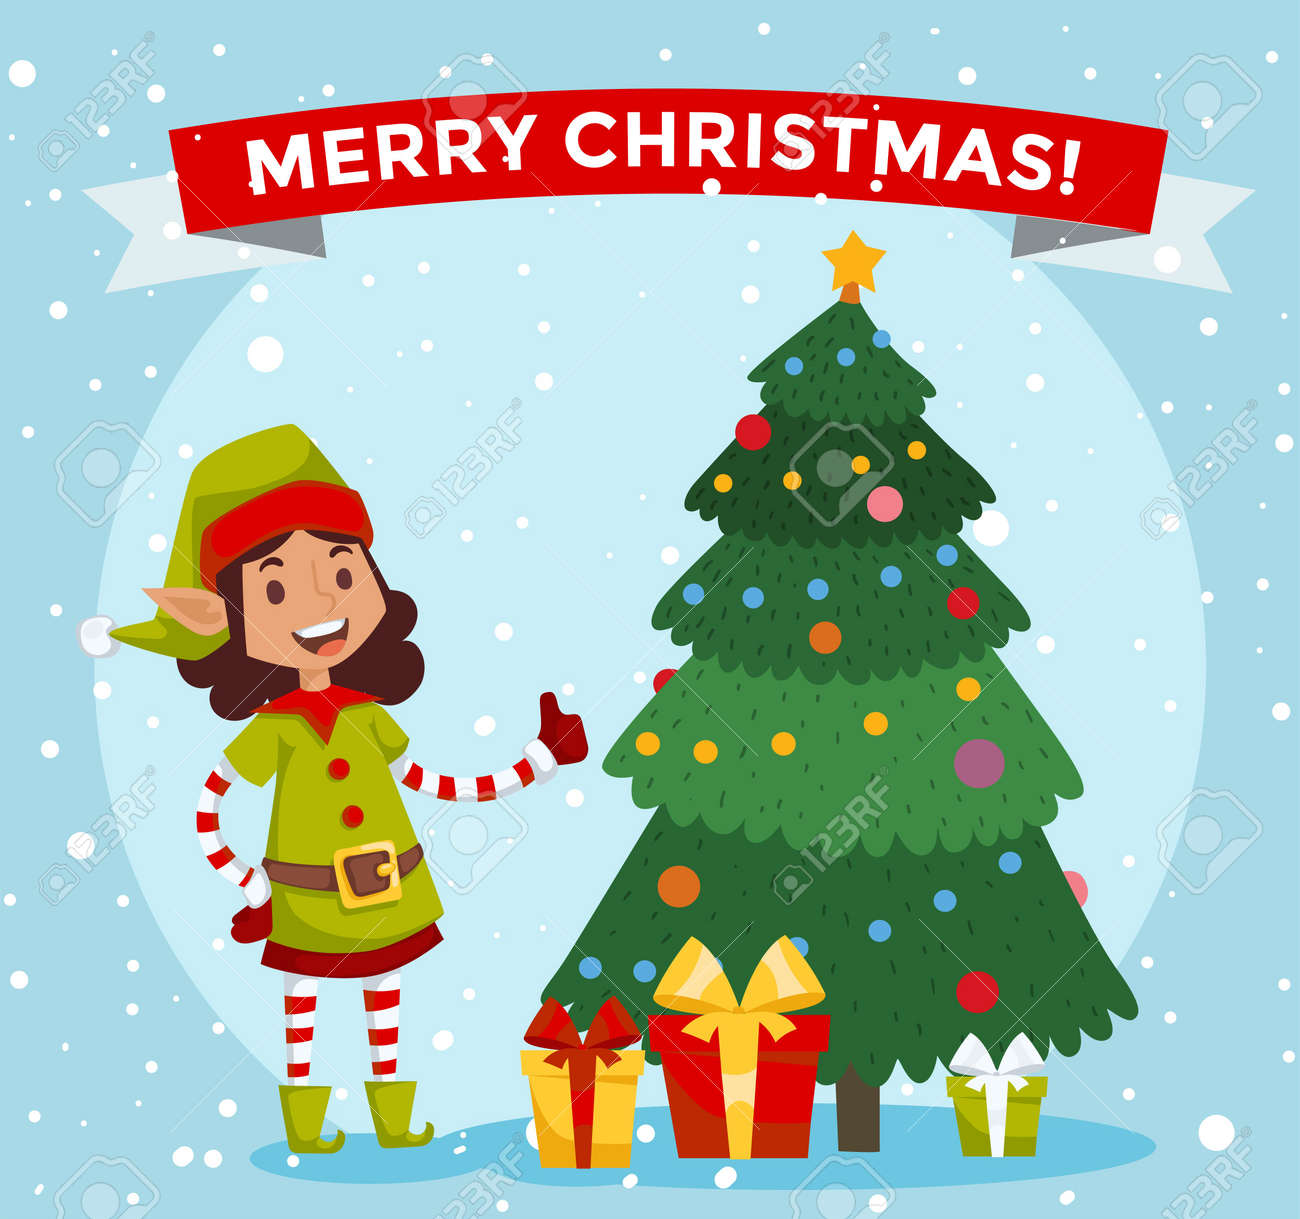 Santa Claus Kids Cartoon Elf Helpers Illustration Santa Claus Elf